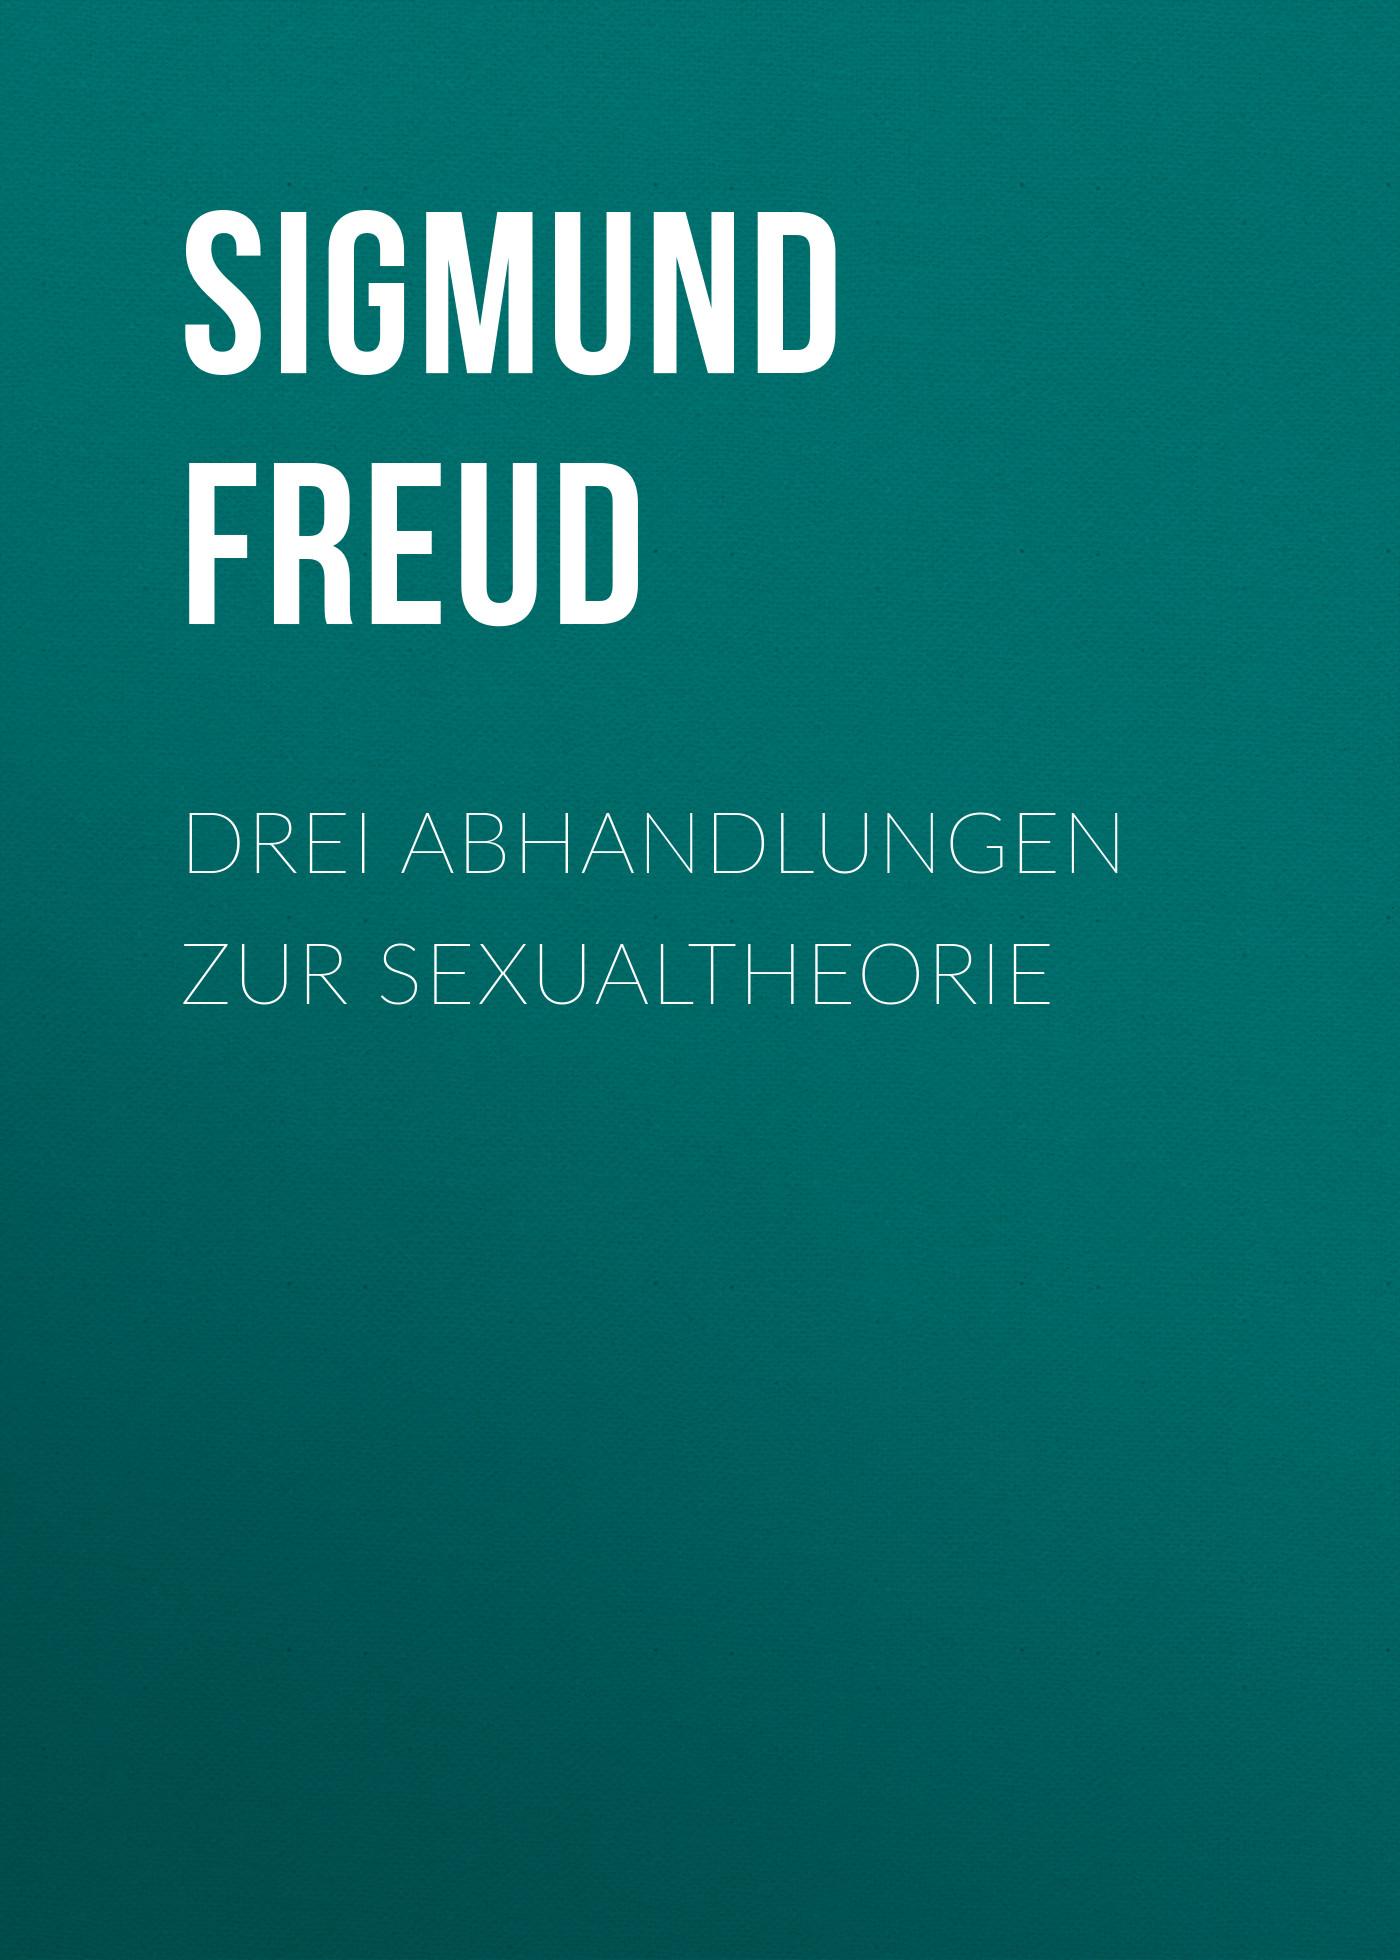 цена на Зигмунд Фрейд Drei Abhandlungen zur Sexualtheorie